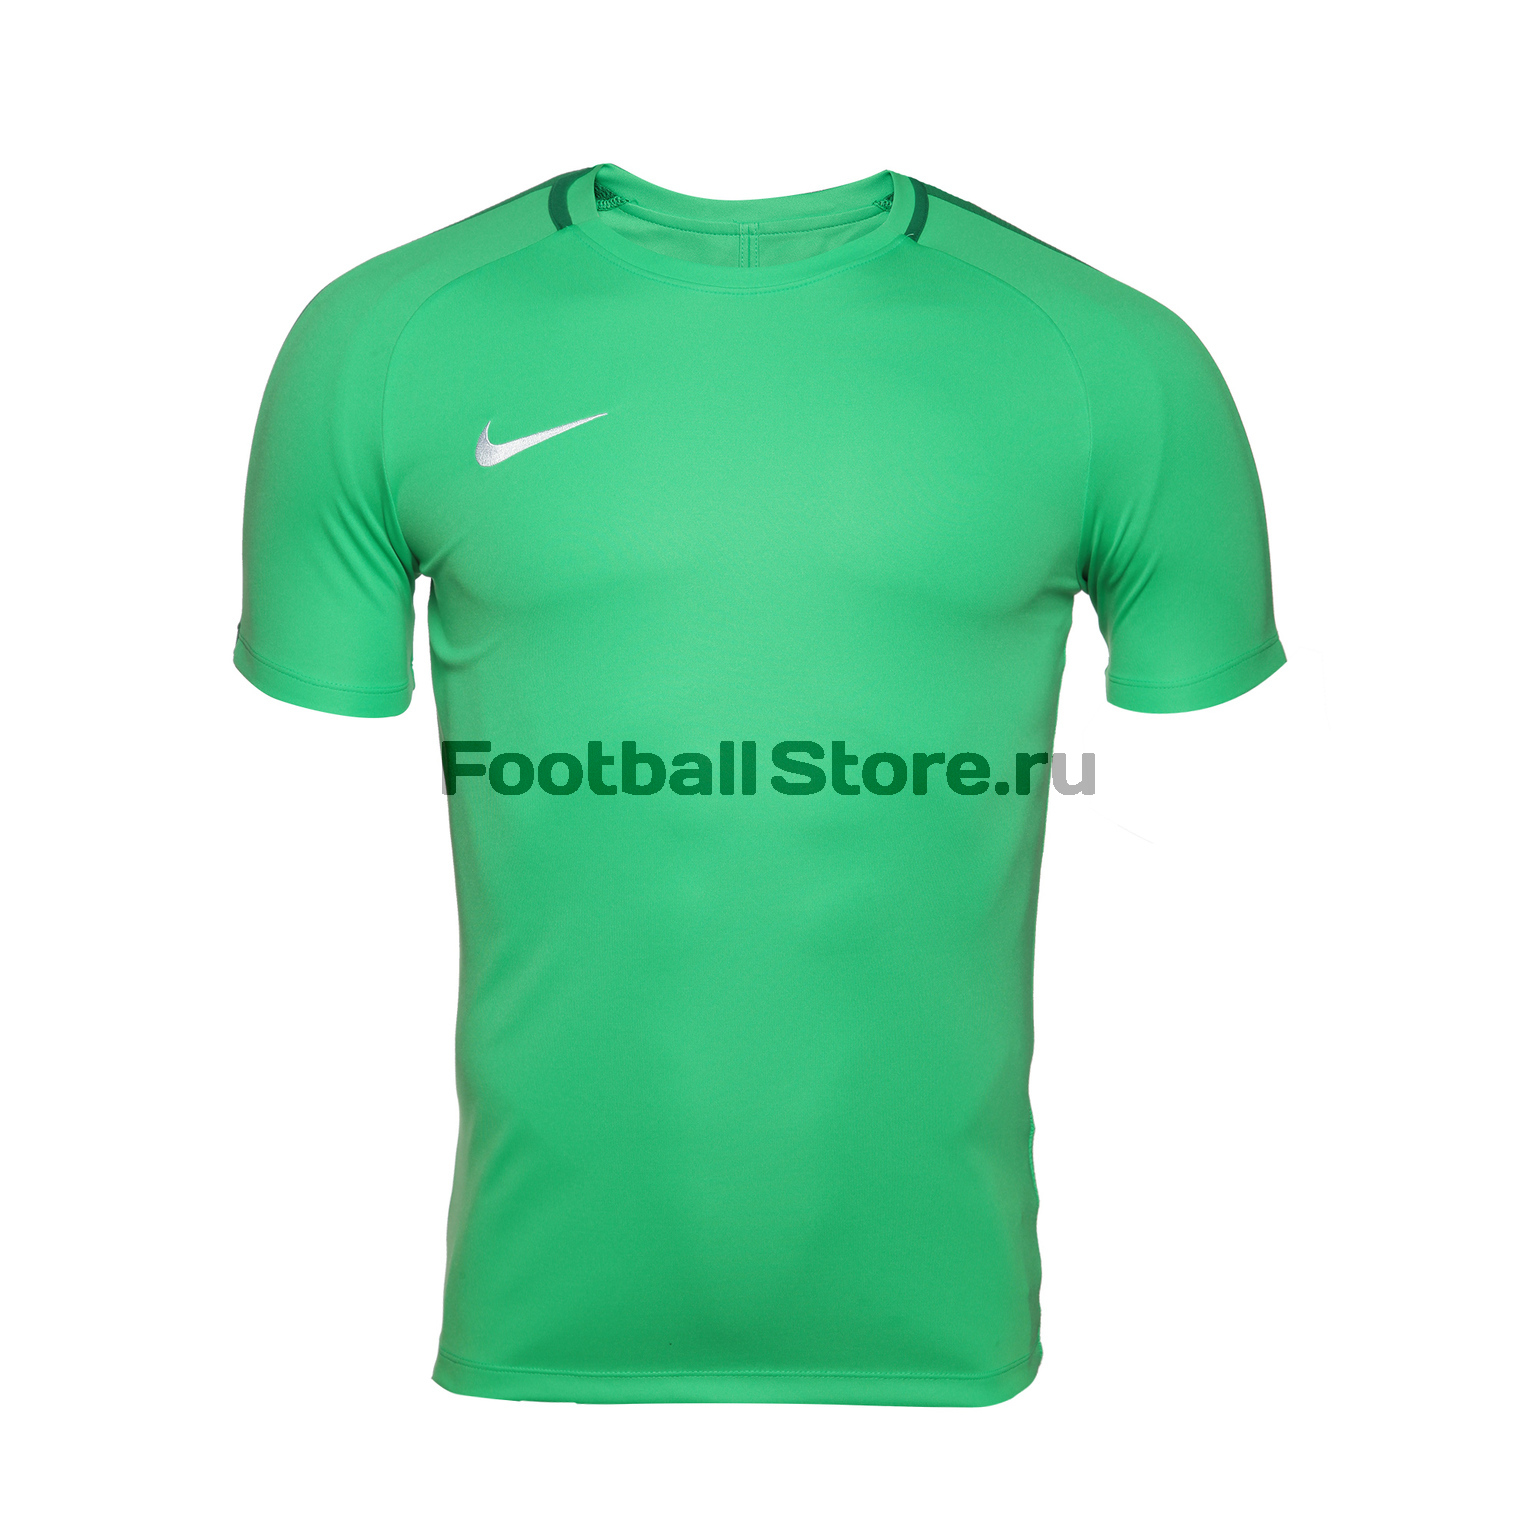 Футболки Nike Футболка тренировочная Nike Dry Academy18 Top SS 893693-361 игровая форма nike футболка детская nike ss precision iii jsy boys 645918 410